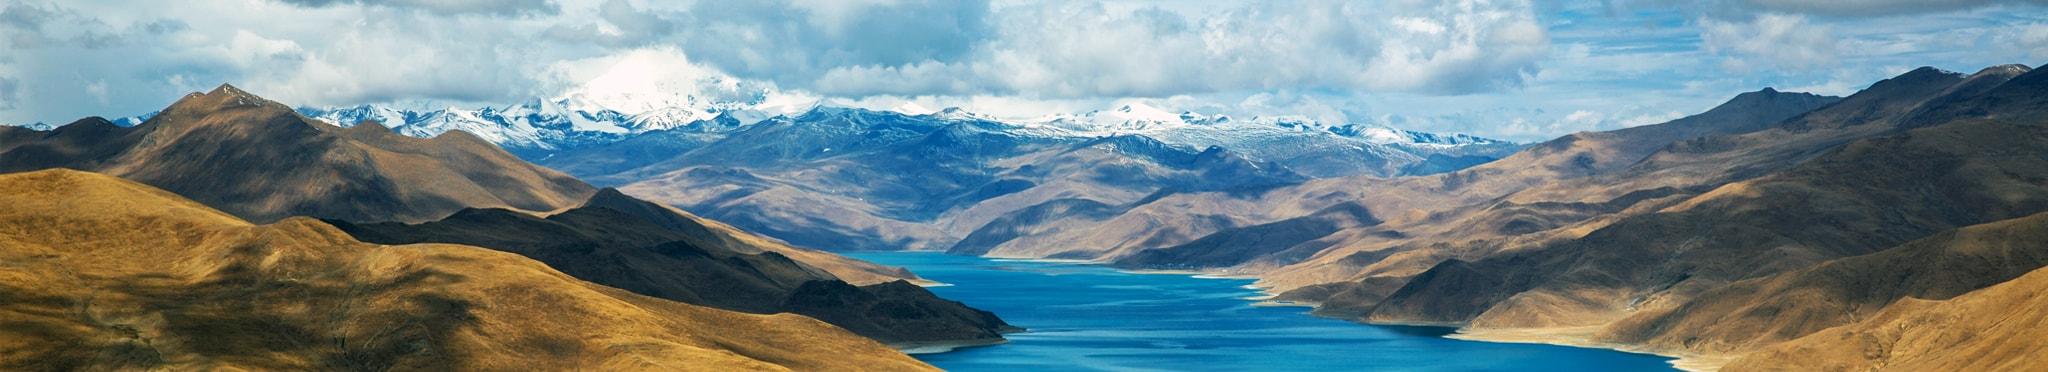 Тайны Тибета <br> Пекин – Лхаса – озеро Ямдрок Цхо — Шанхай